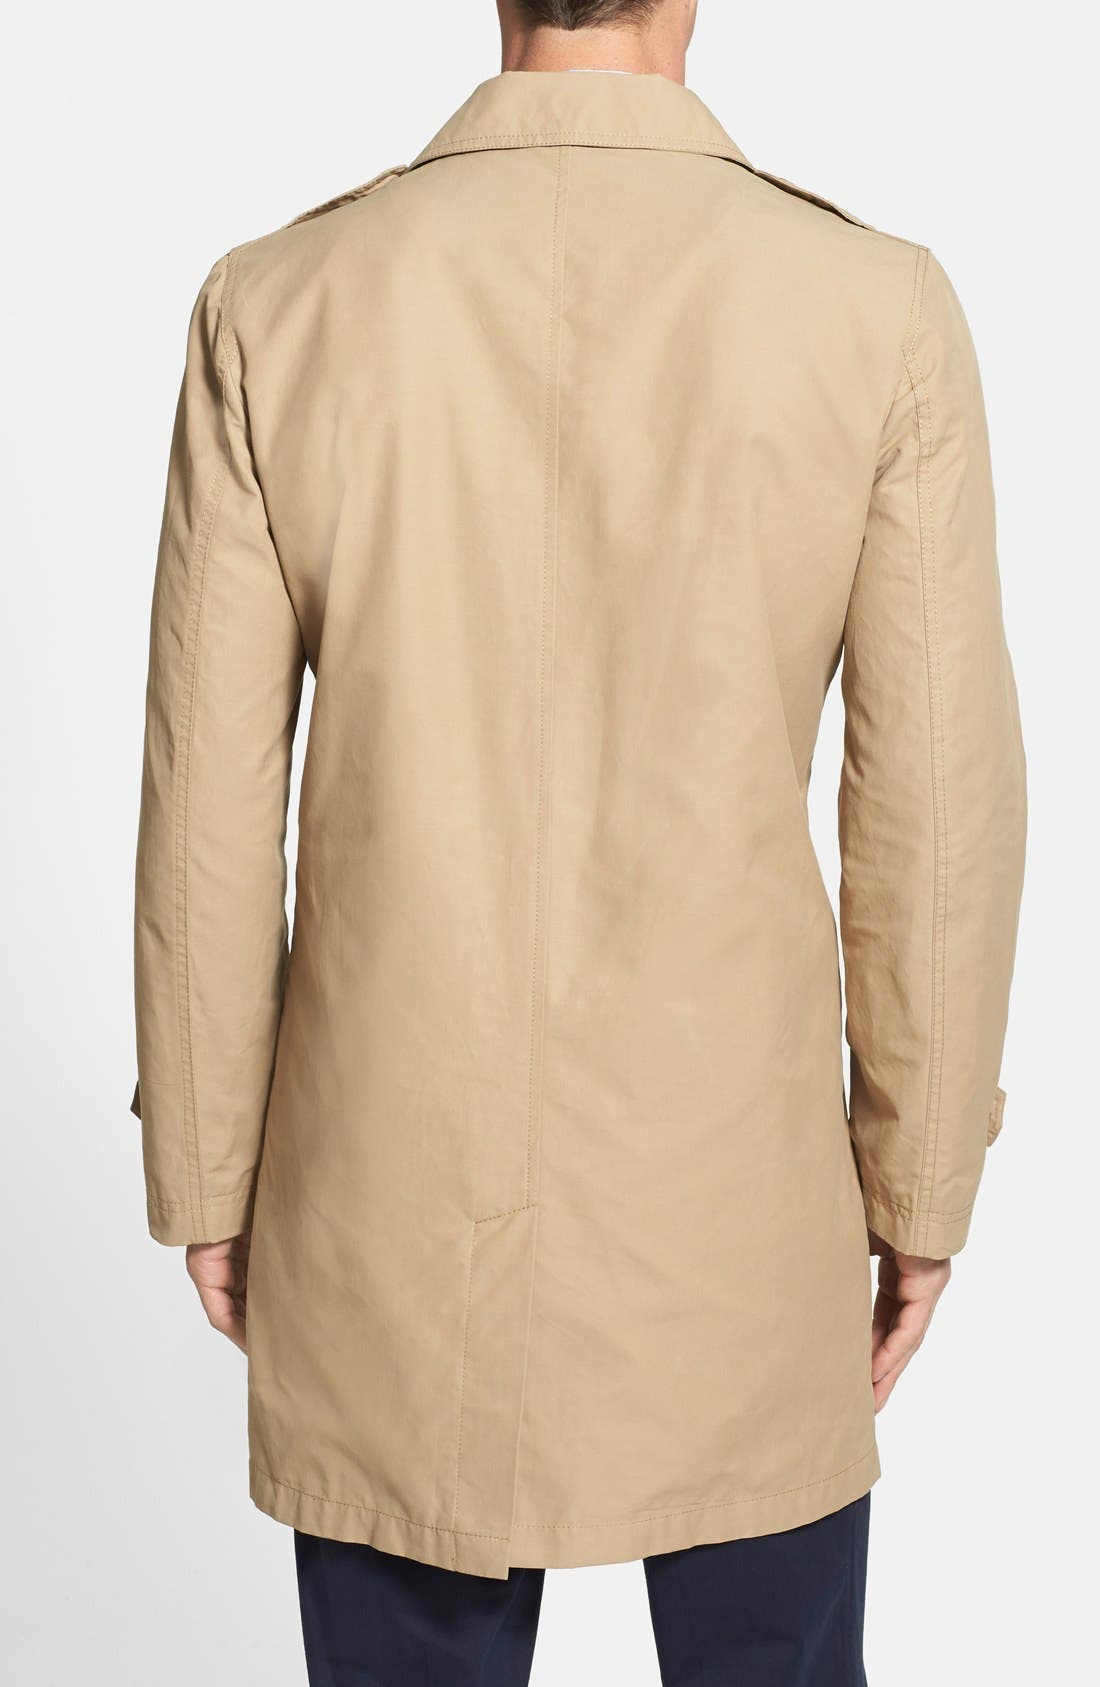 COLE HAAN,                             Cotton Blend Twill Car Coat,                             Alternate thumbnail 3, color,                             258